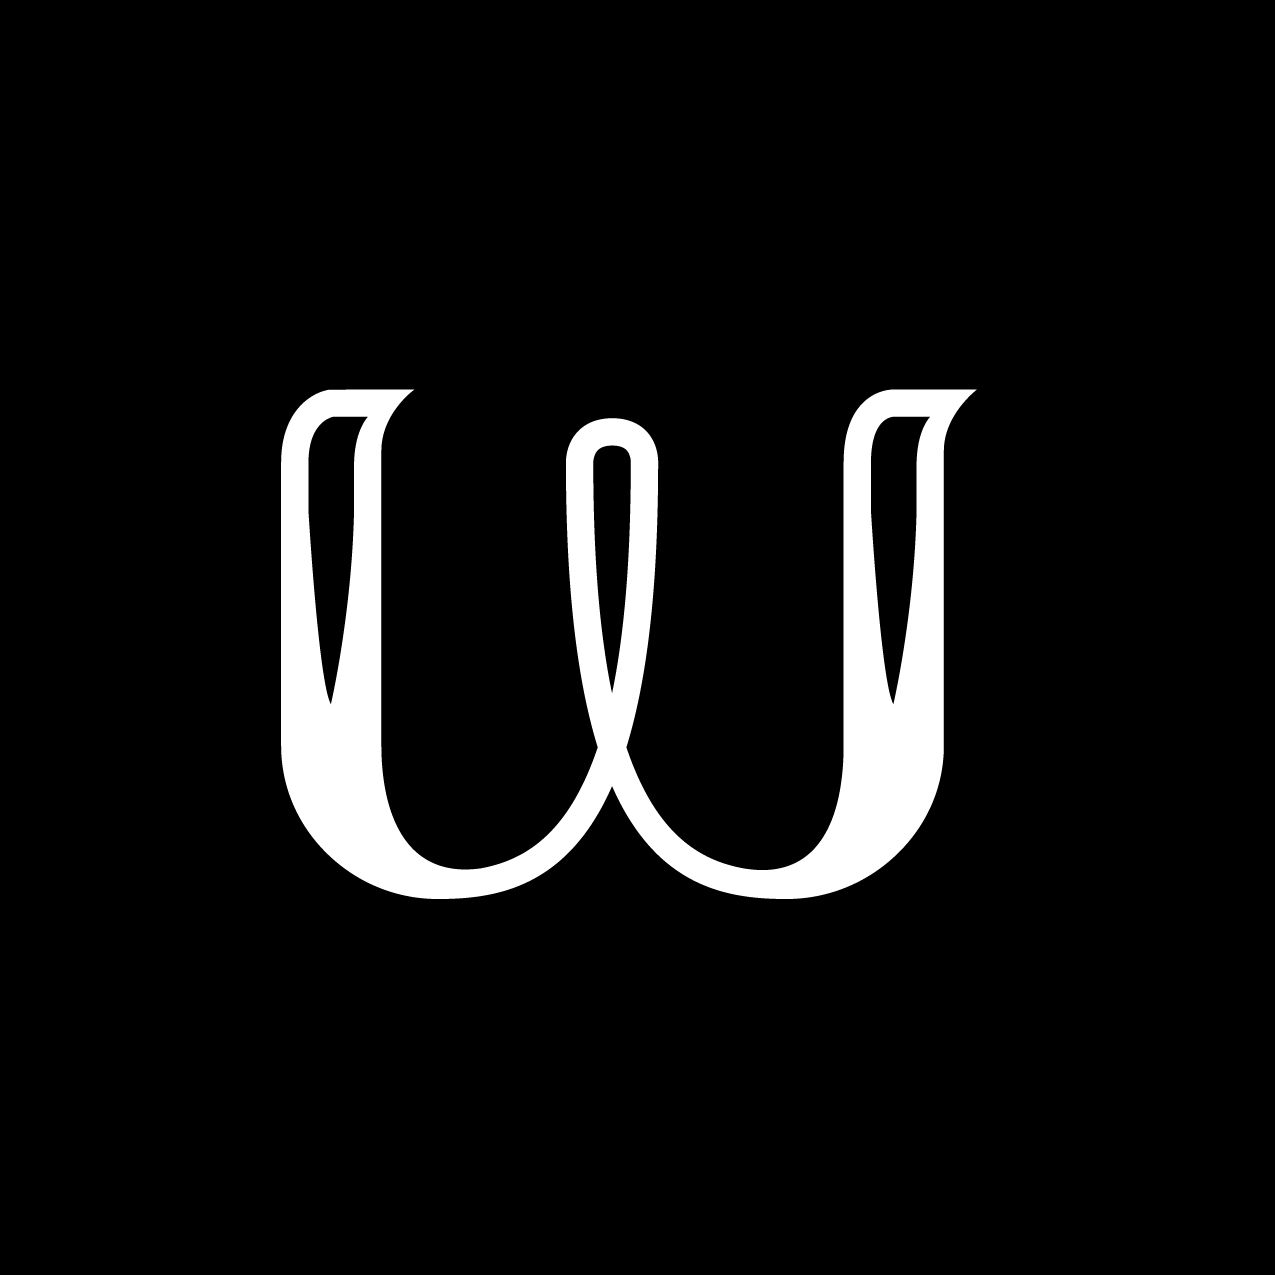 Letter W1 Design by Furia